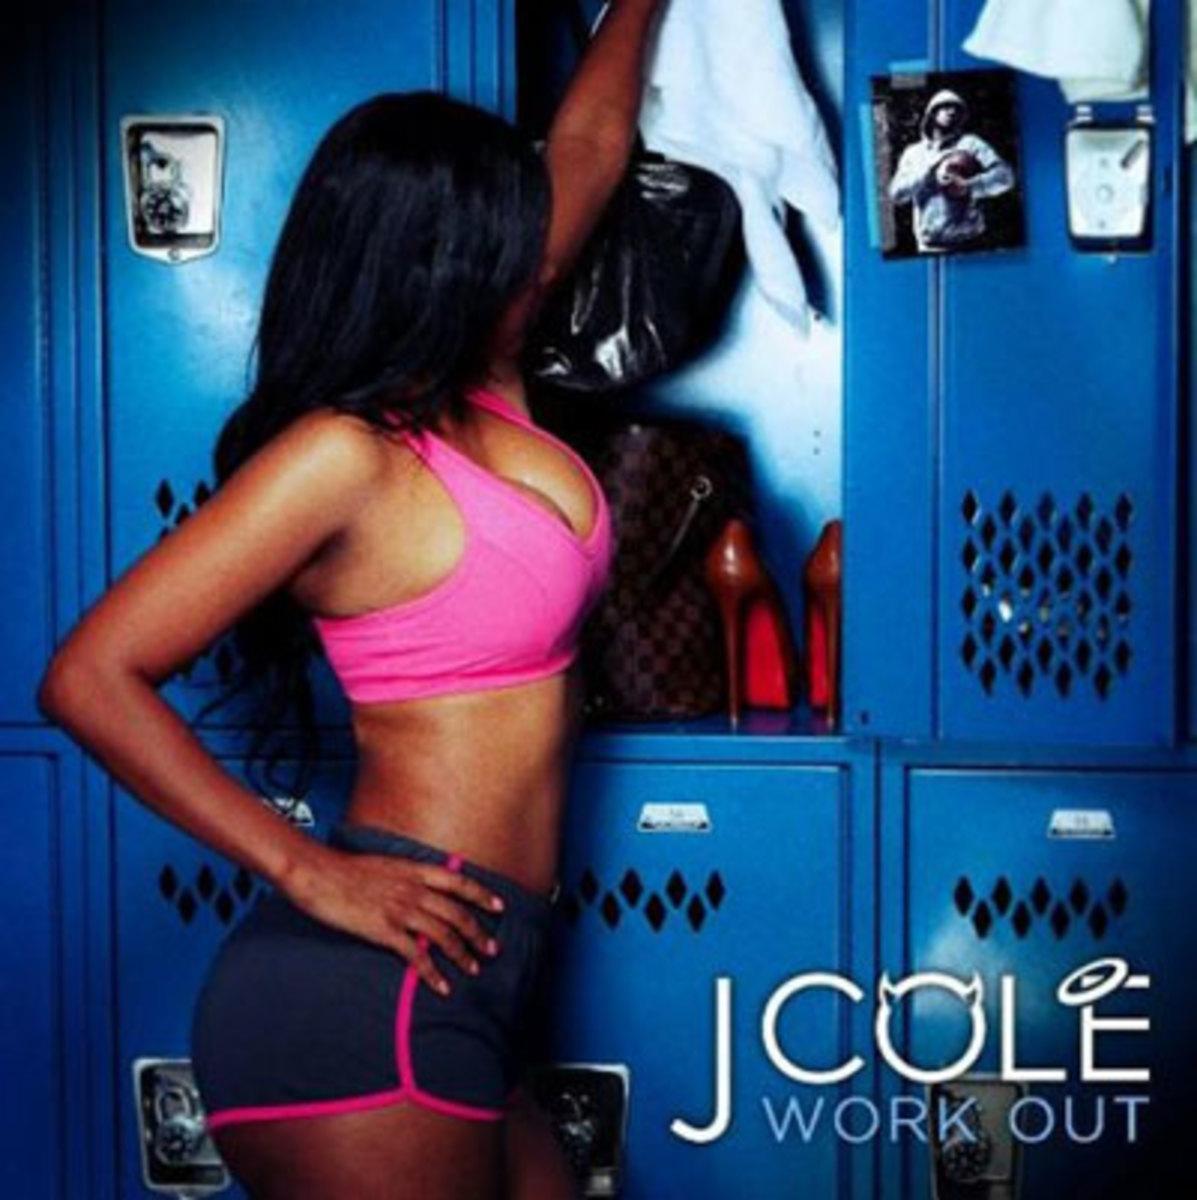 jcole-workout.jpg